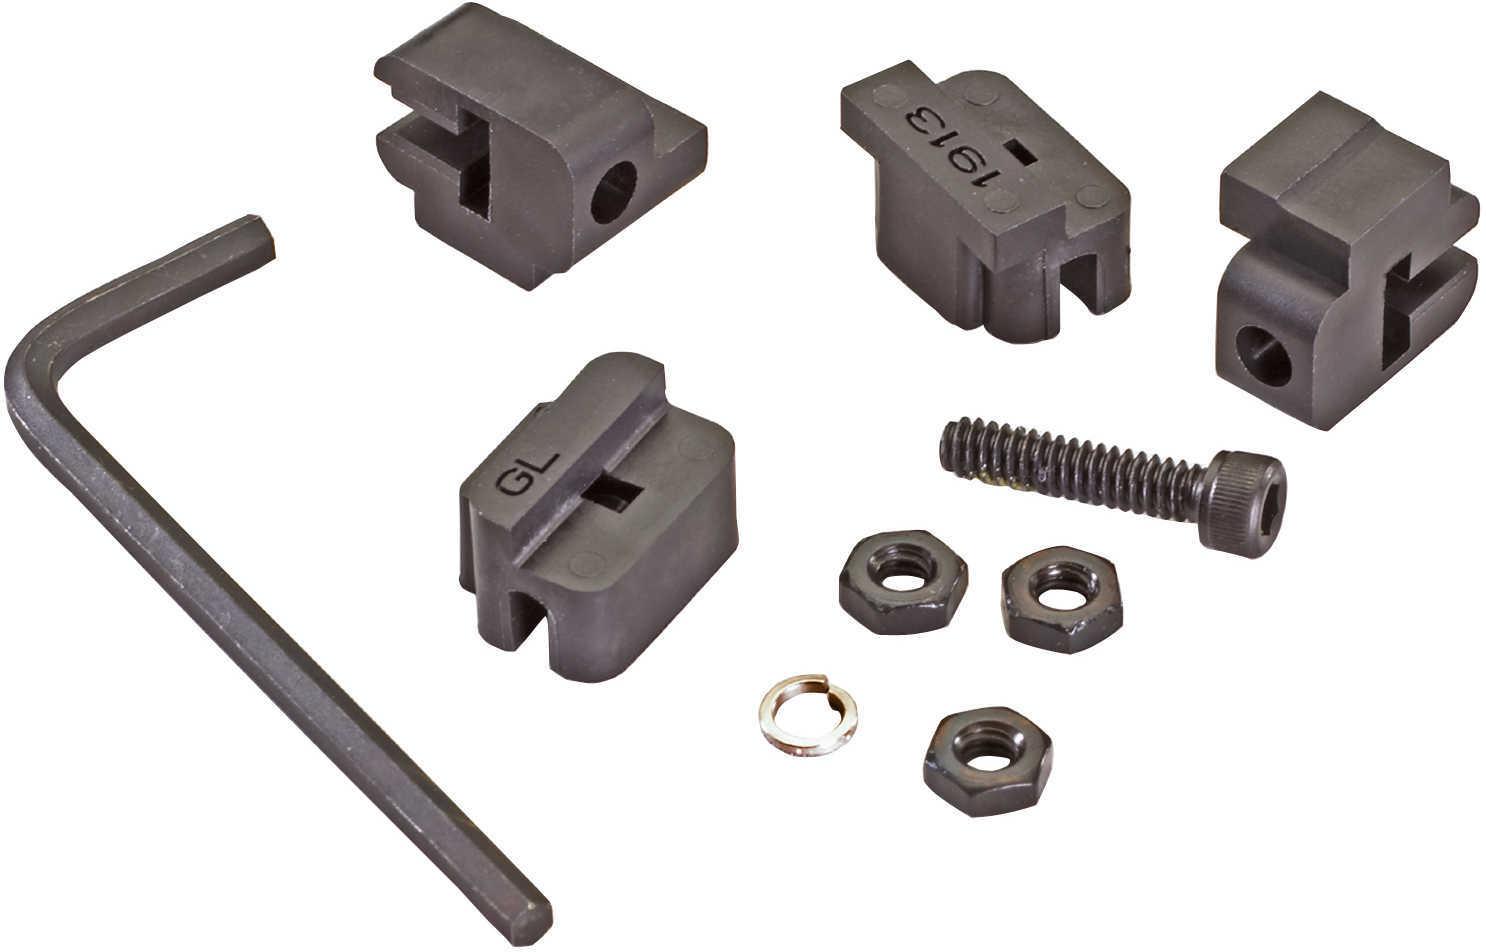 Streamlight TLR Key Kit Md: 69175